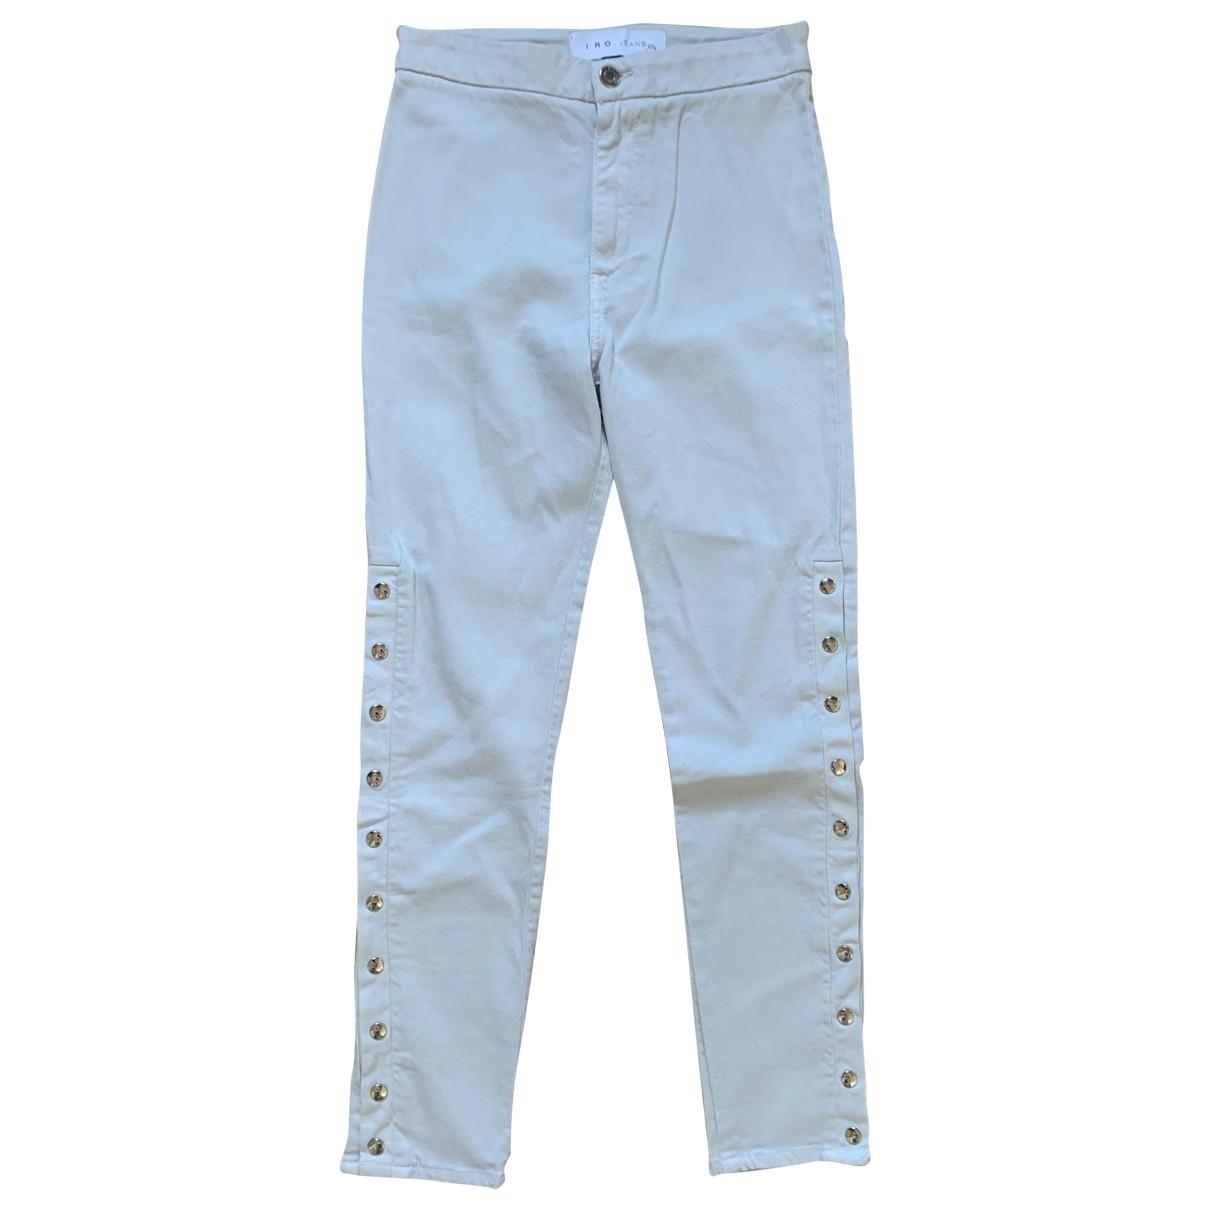 Iro \N Grey Cotton - elasthane Jeans for Women 26 US